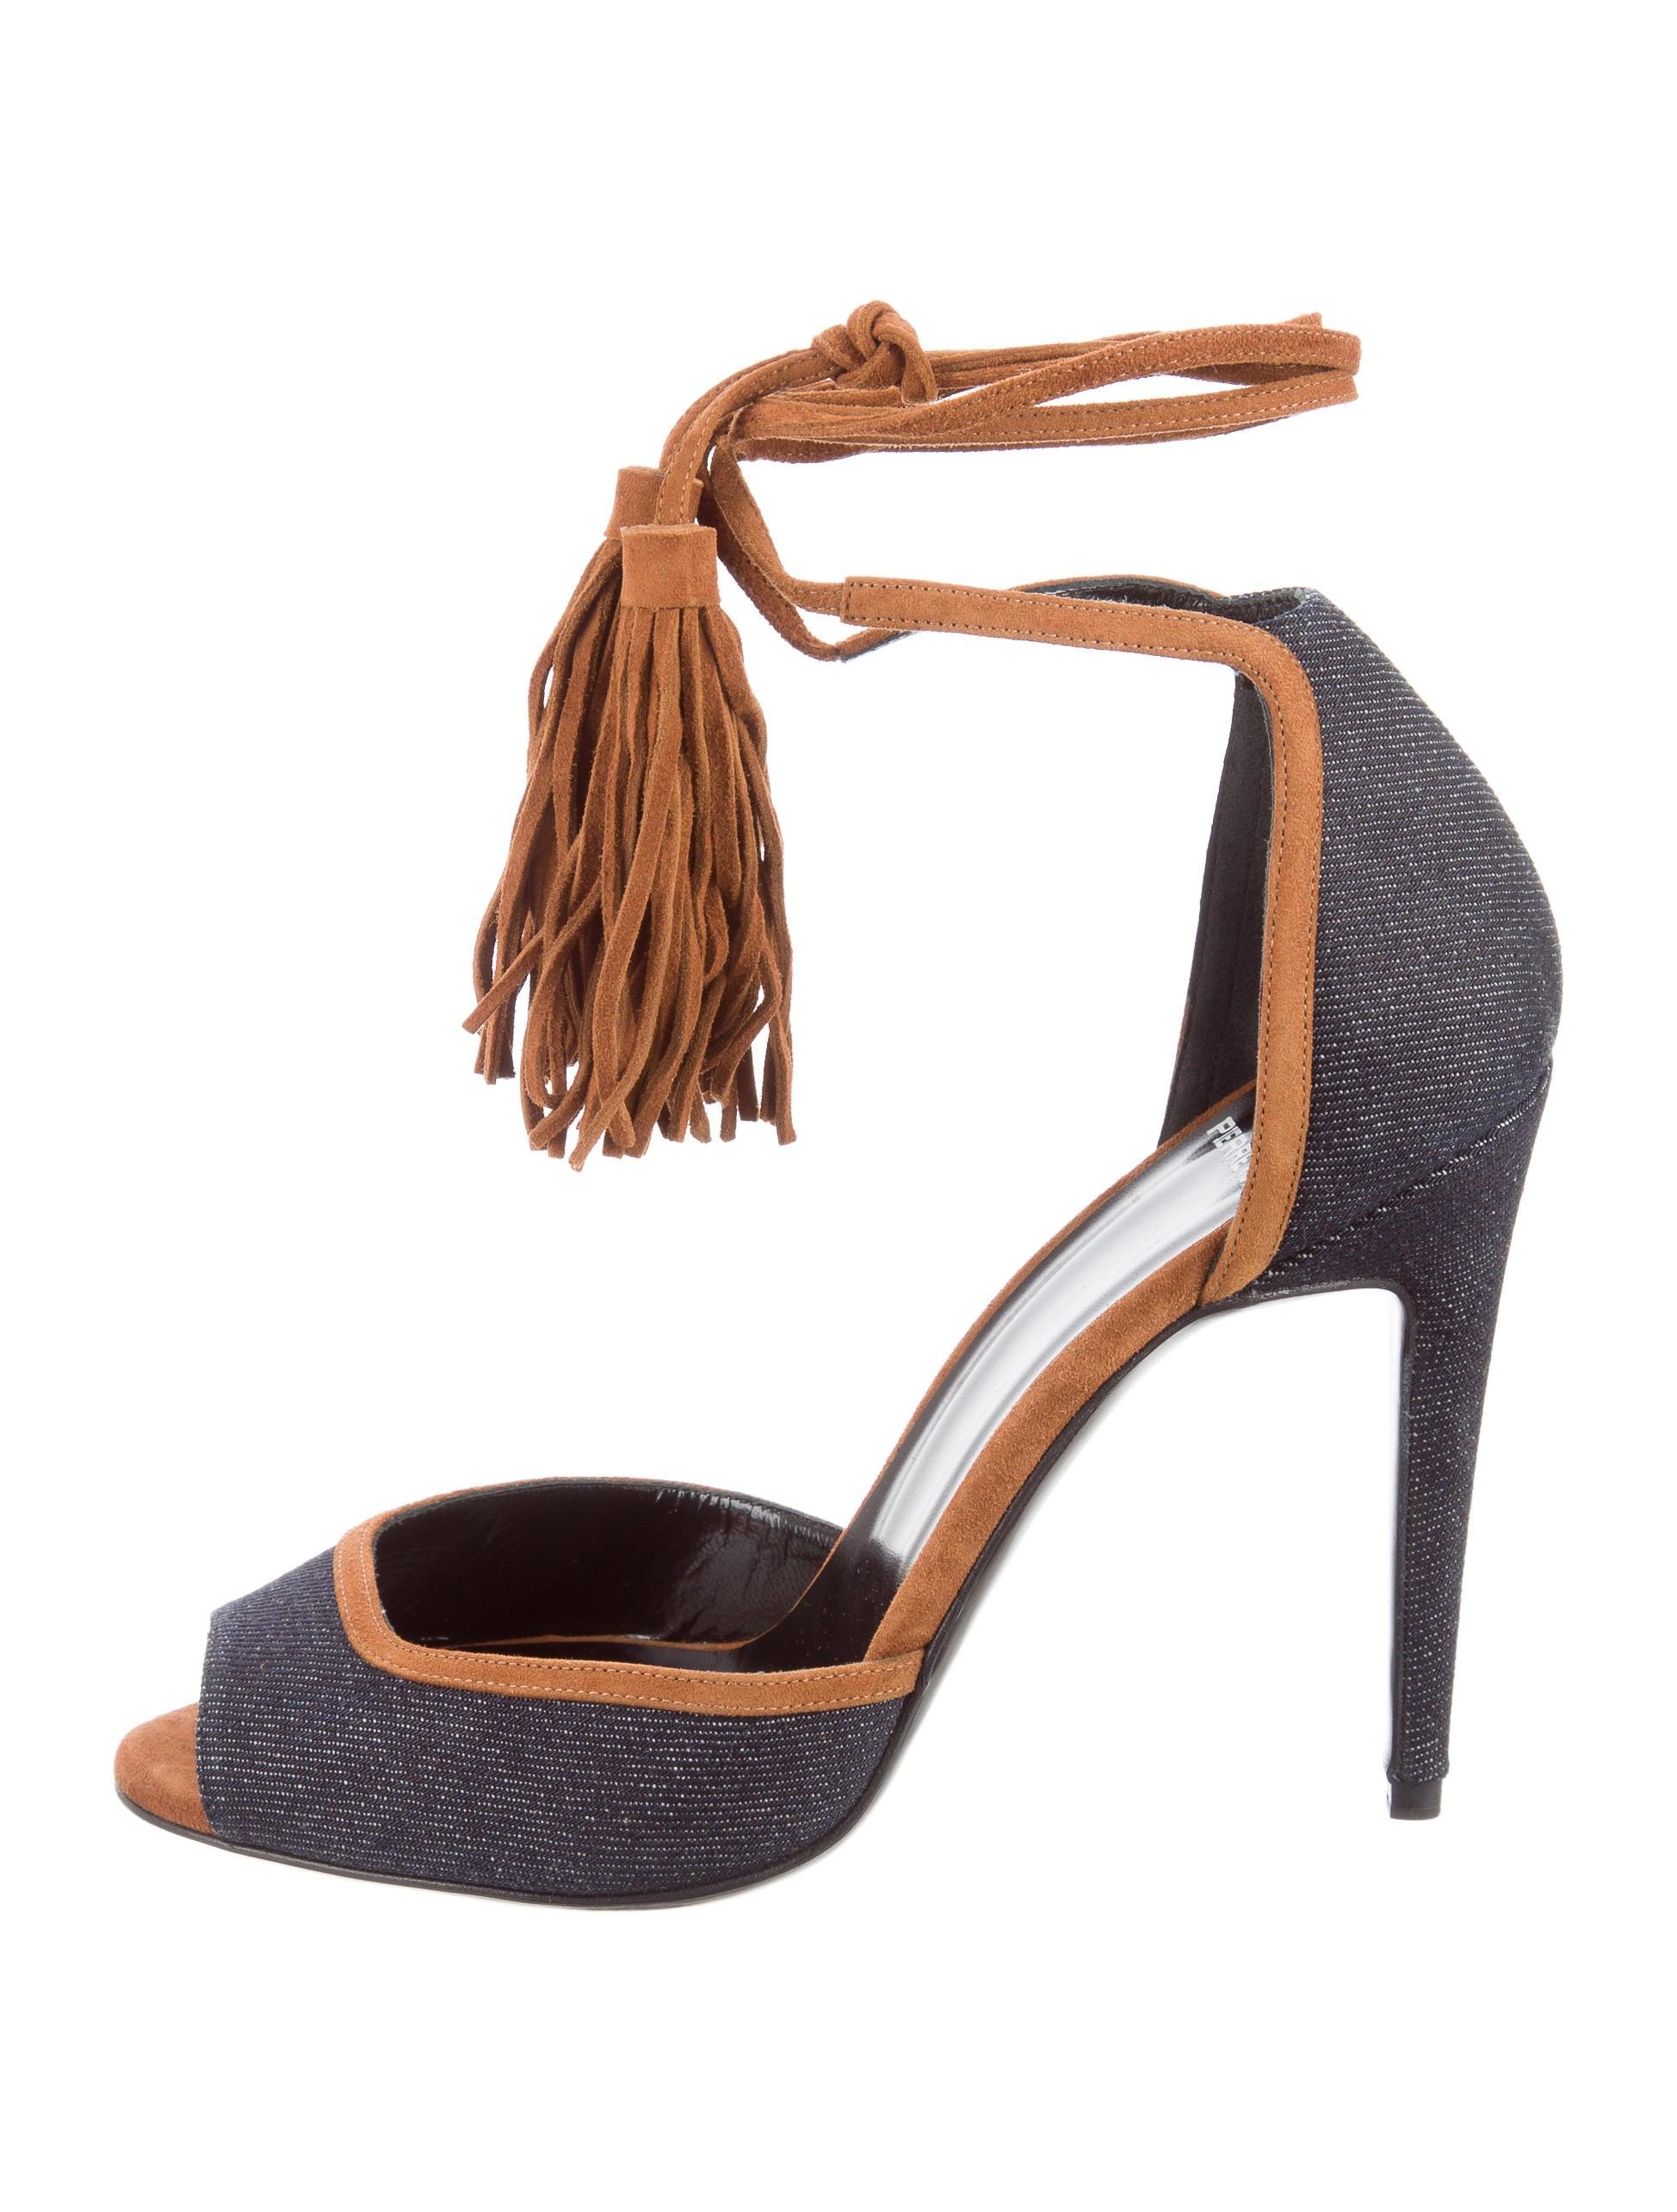 Pierre Hardy Marjorelle Denim Pumps w/ Tags - Shoes ...